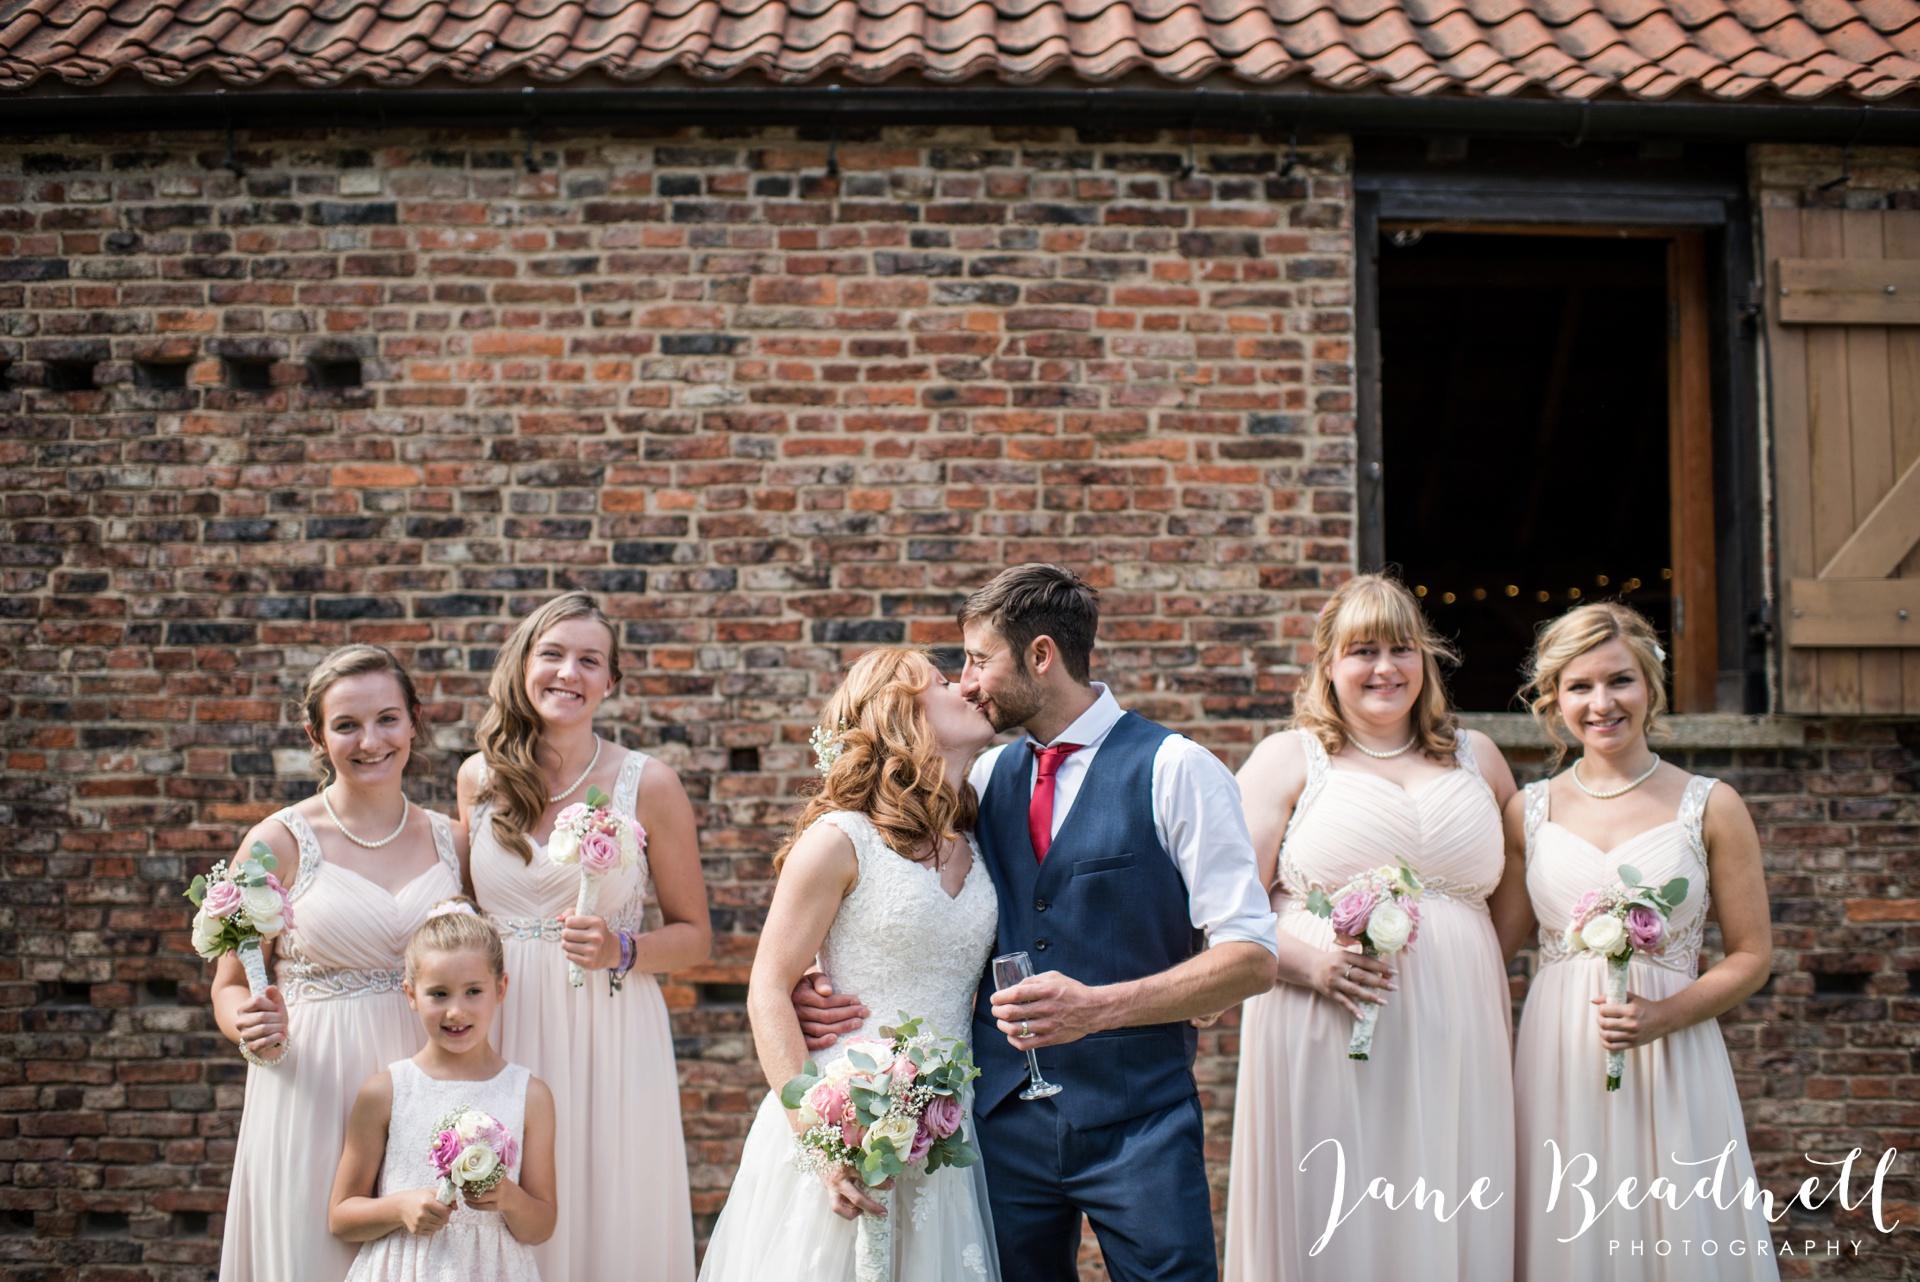 yorkshire-fine-art-wedding-photographer-jane-beadnell-photography-poppleton-york_0090